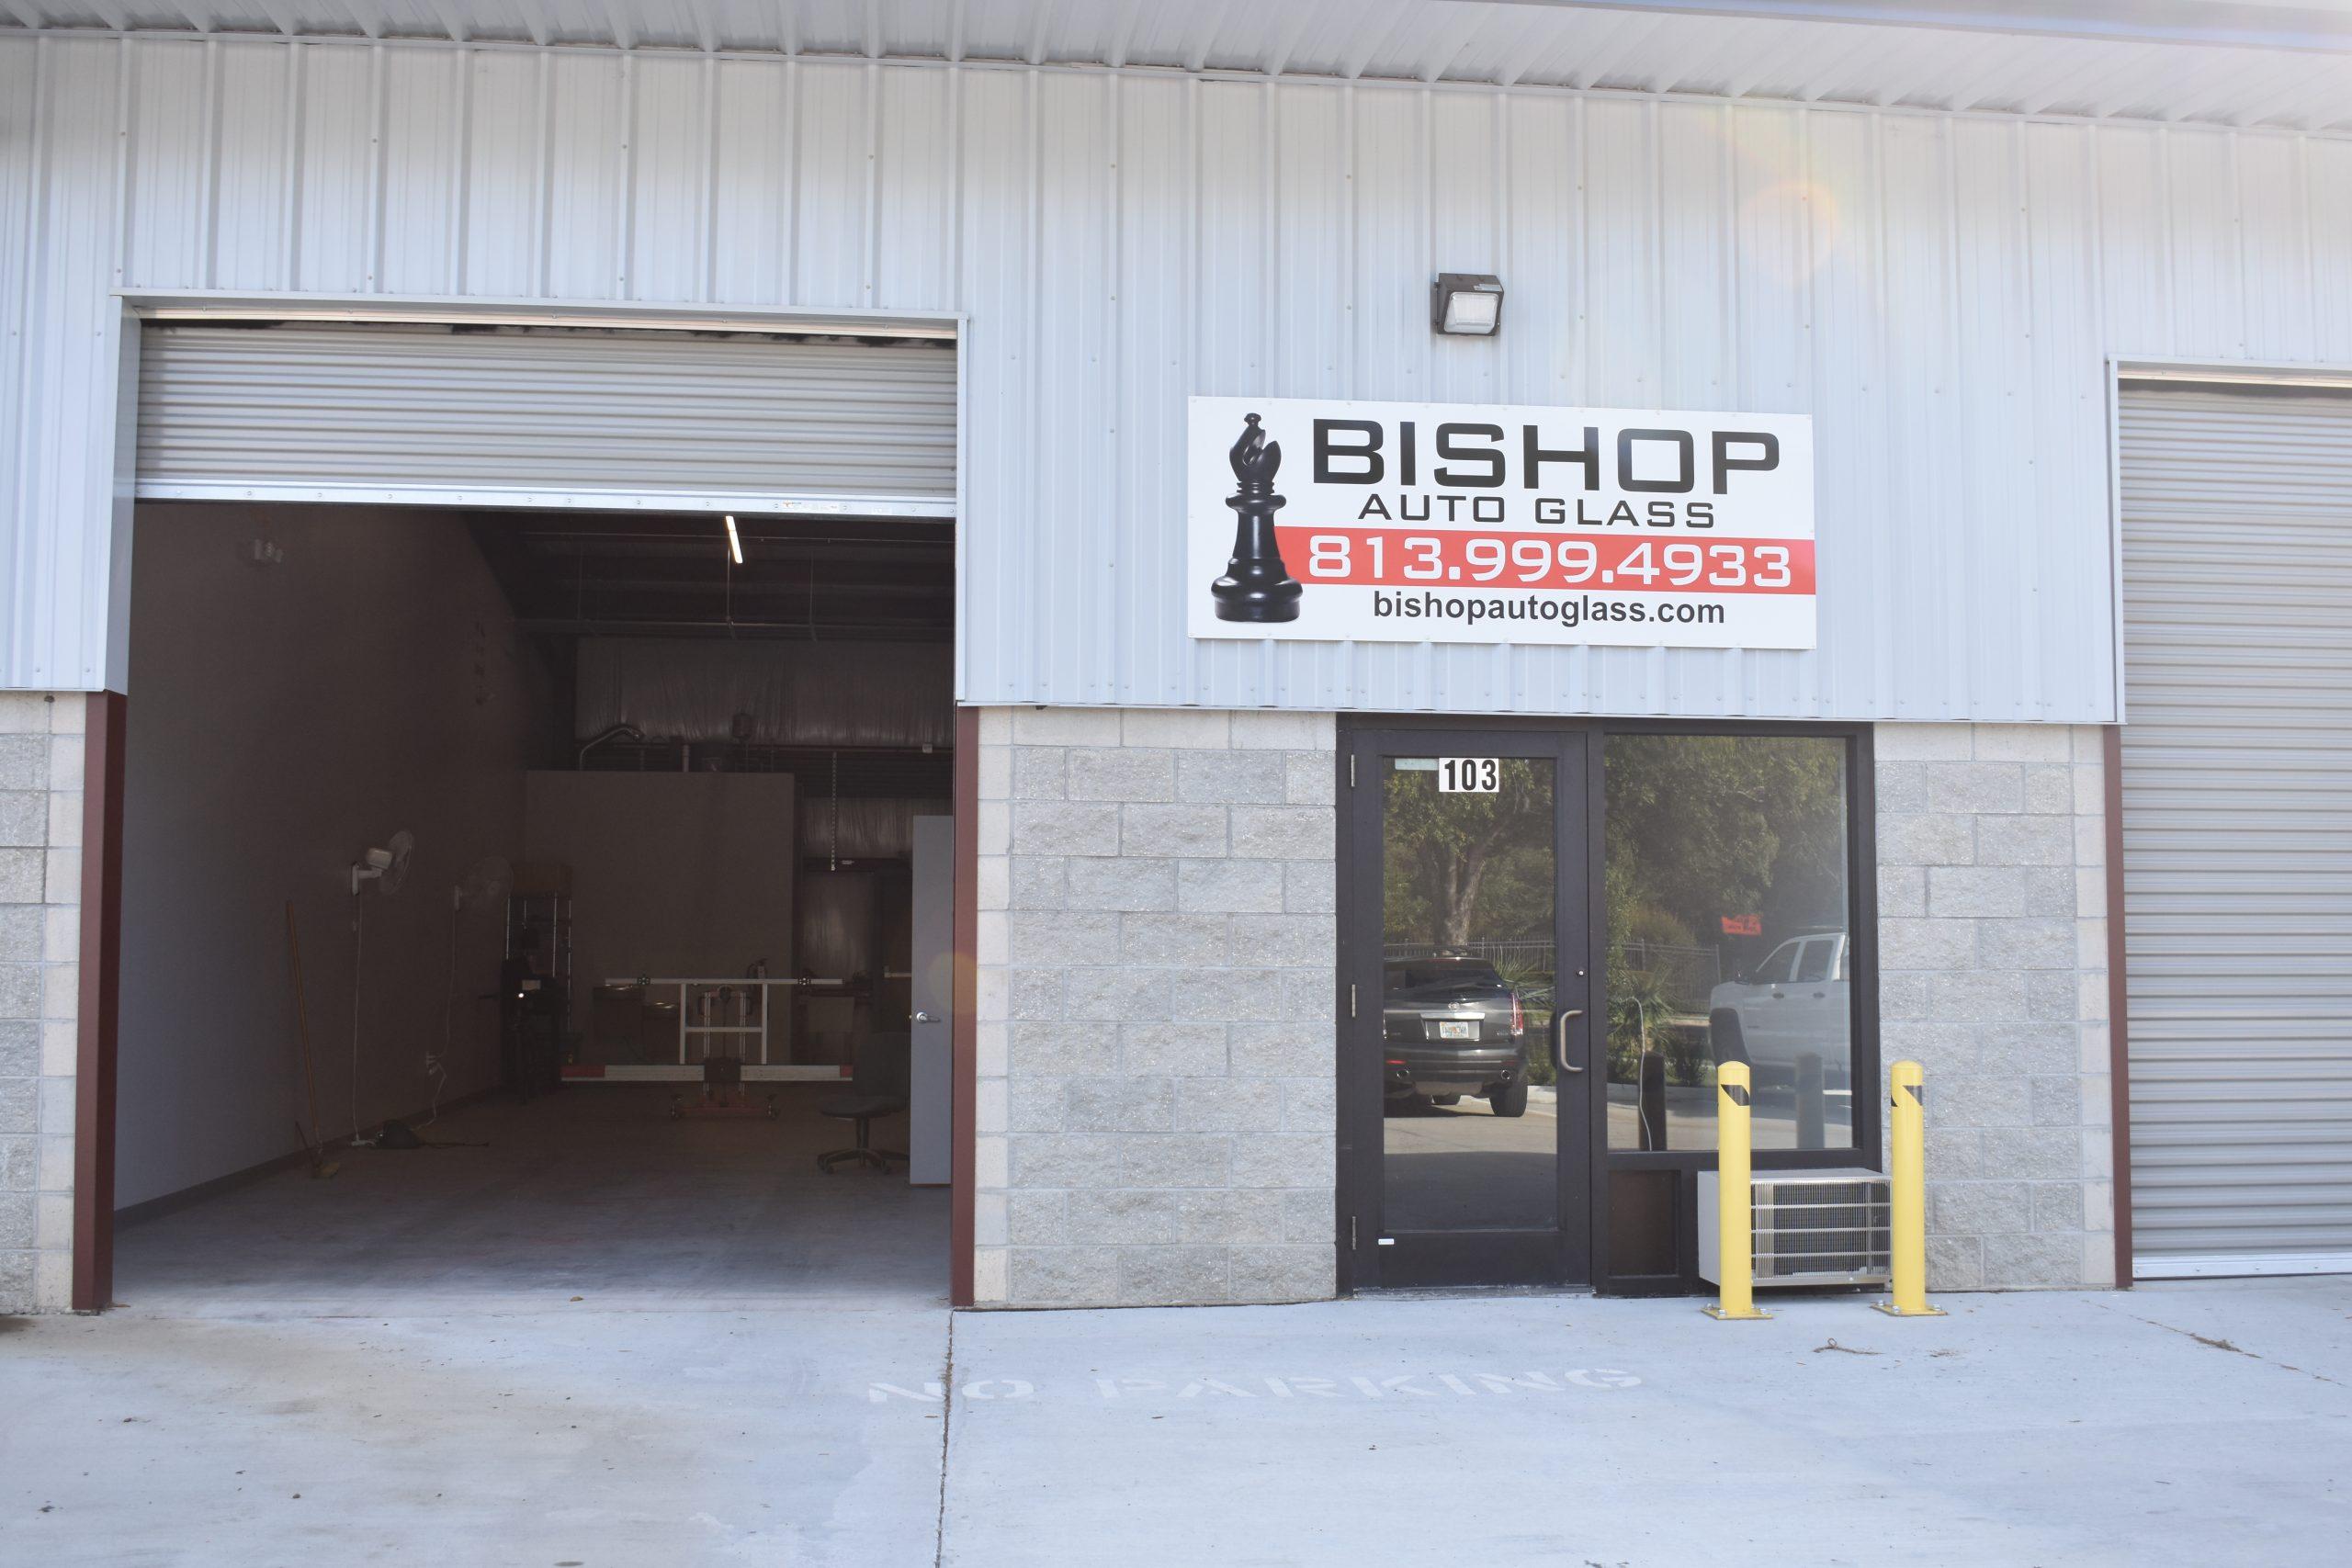 Bishop Auto Glass Tampa shop